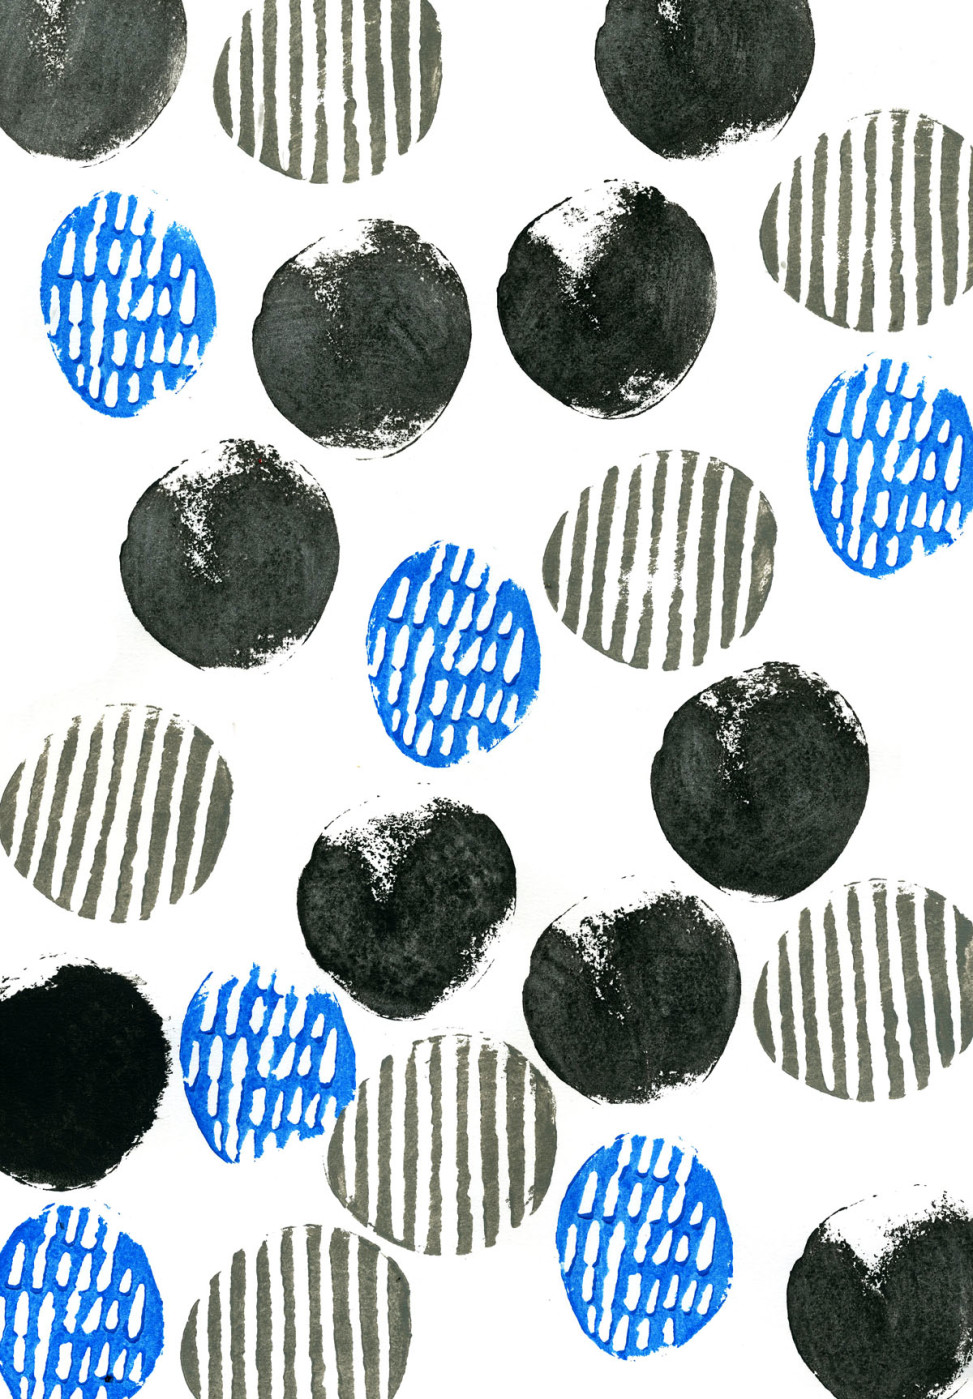 Wrapping paper abstract potato print by Matt Johnson